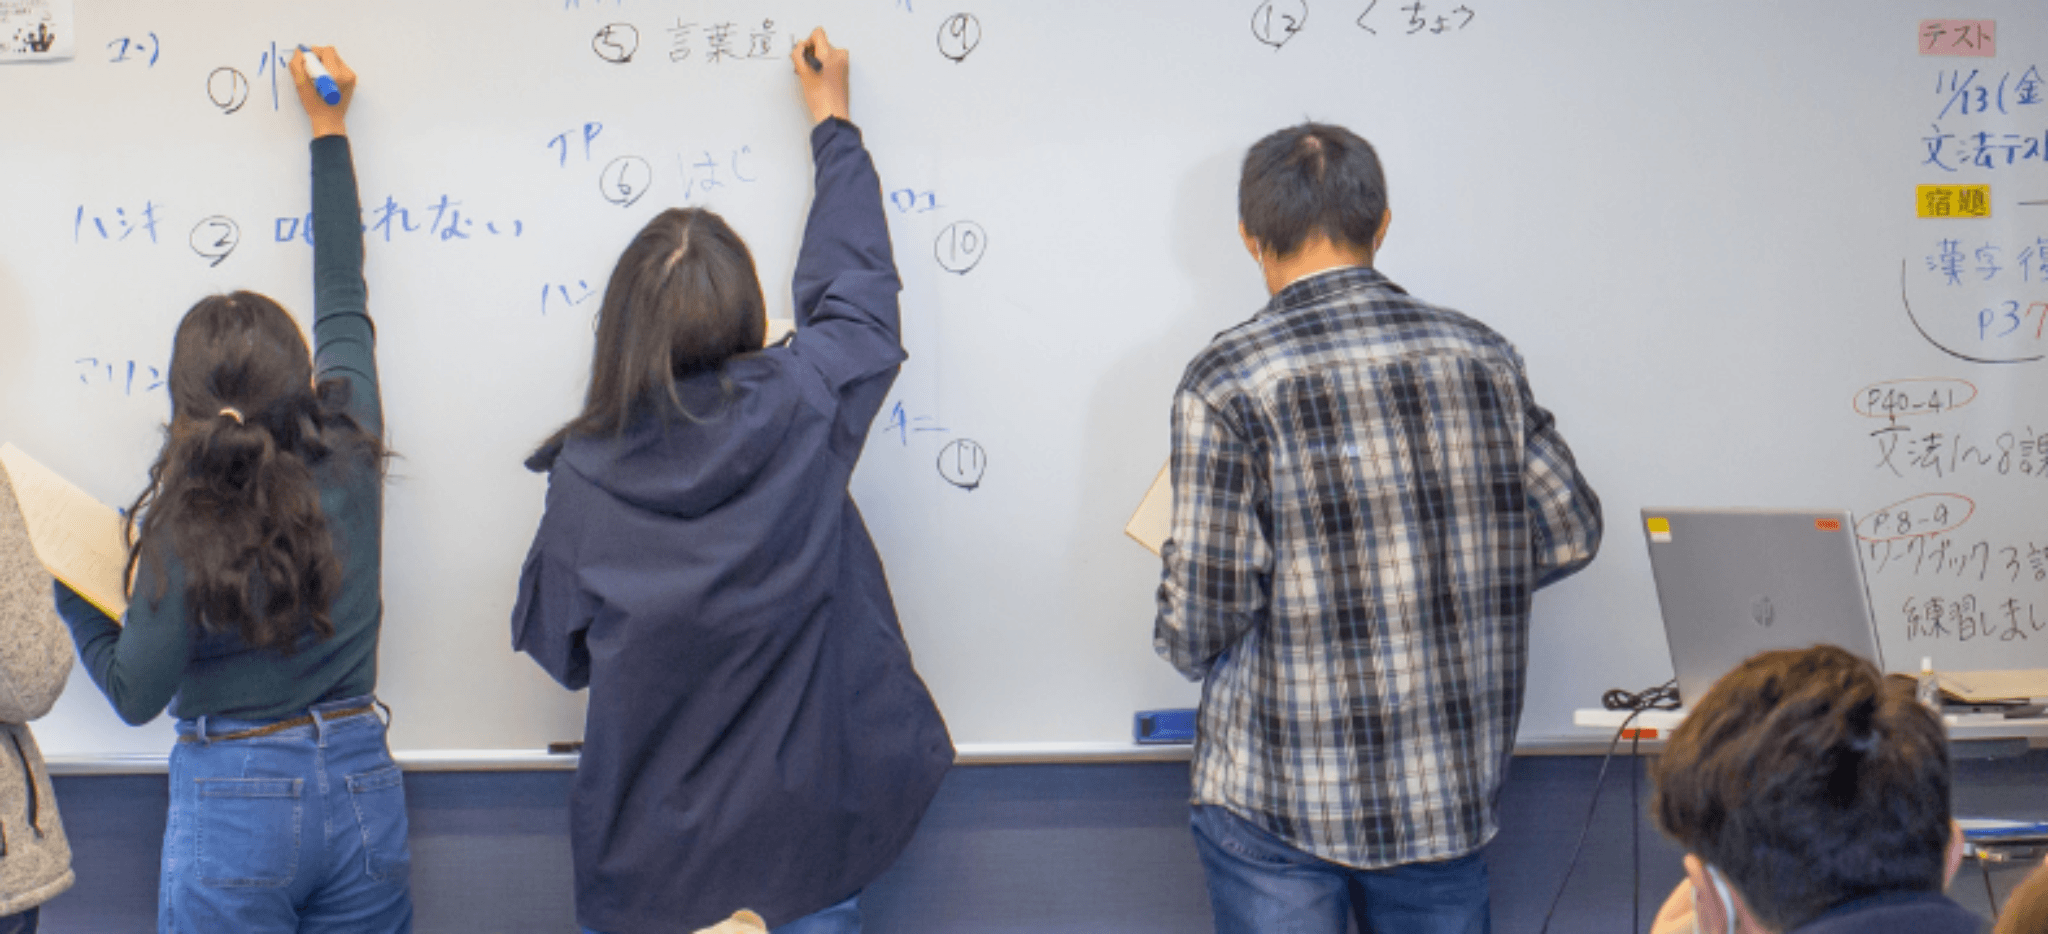 razones para aprender japonés